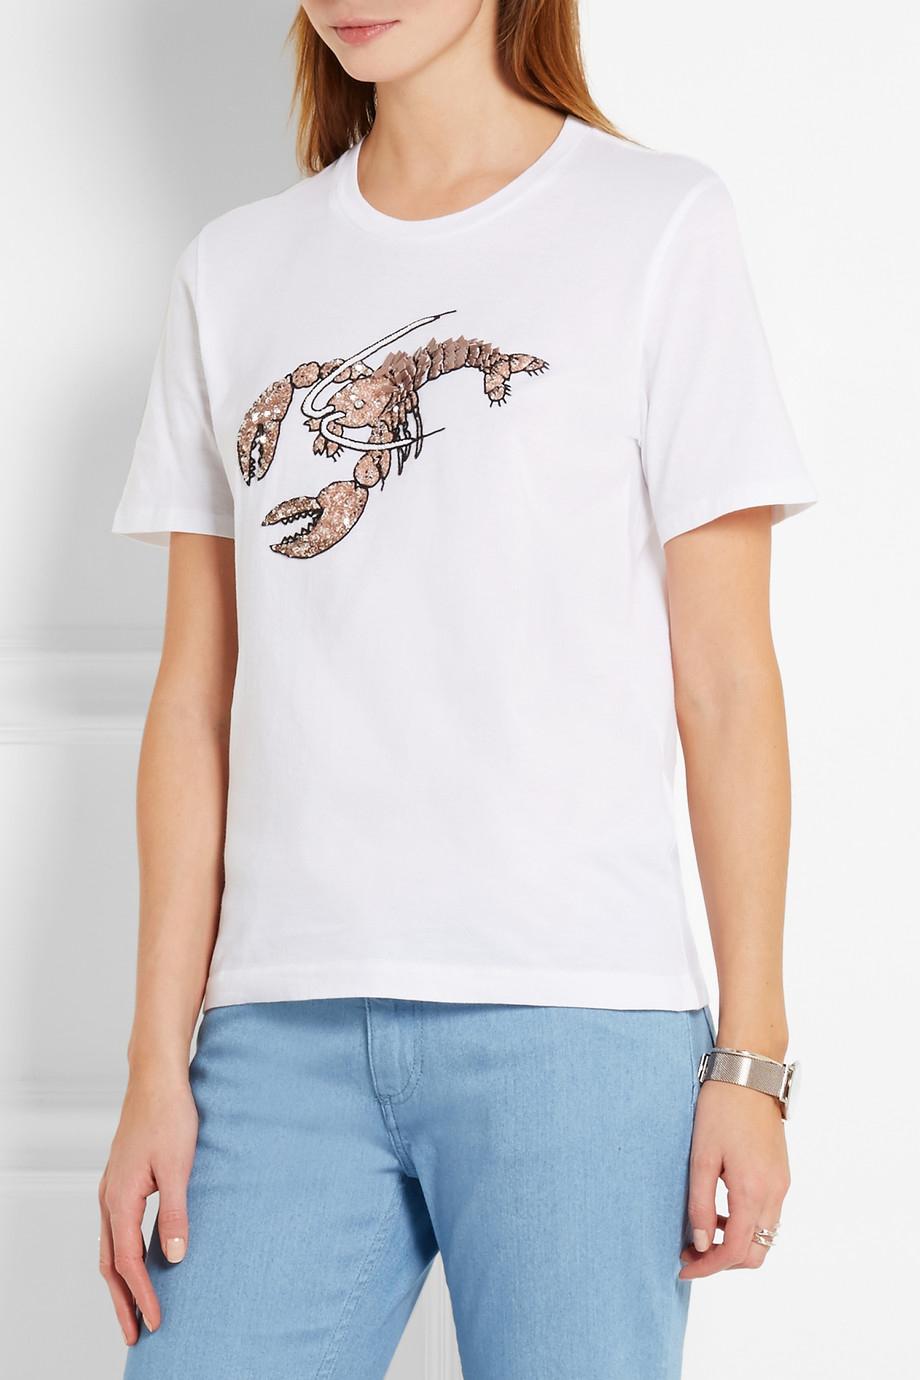 MARKUS LUPFER Lobster Sequined T-shirt $310